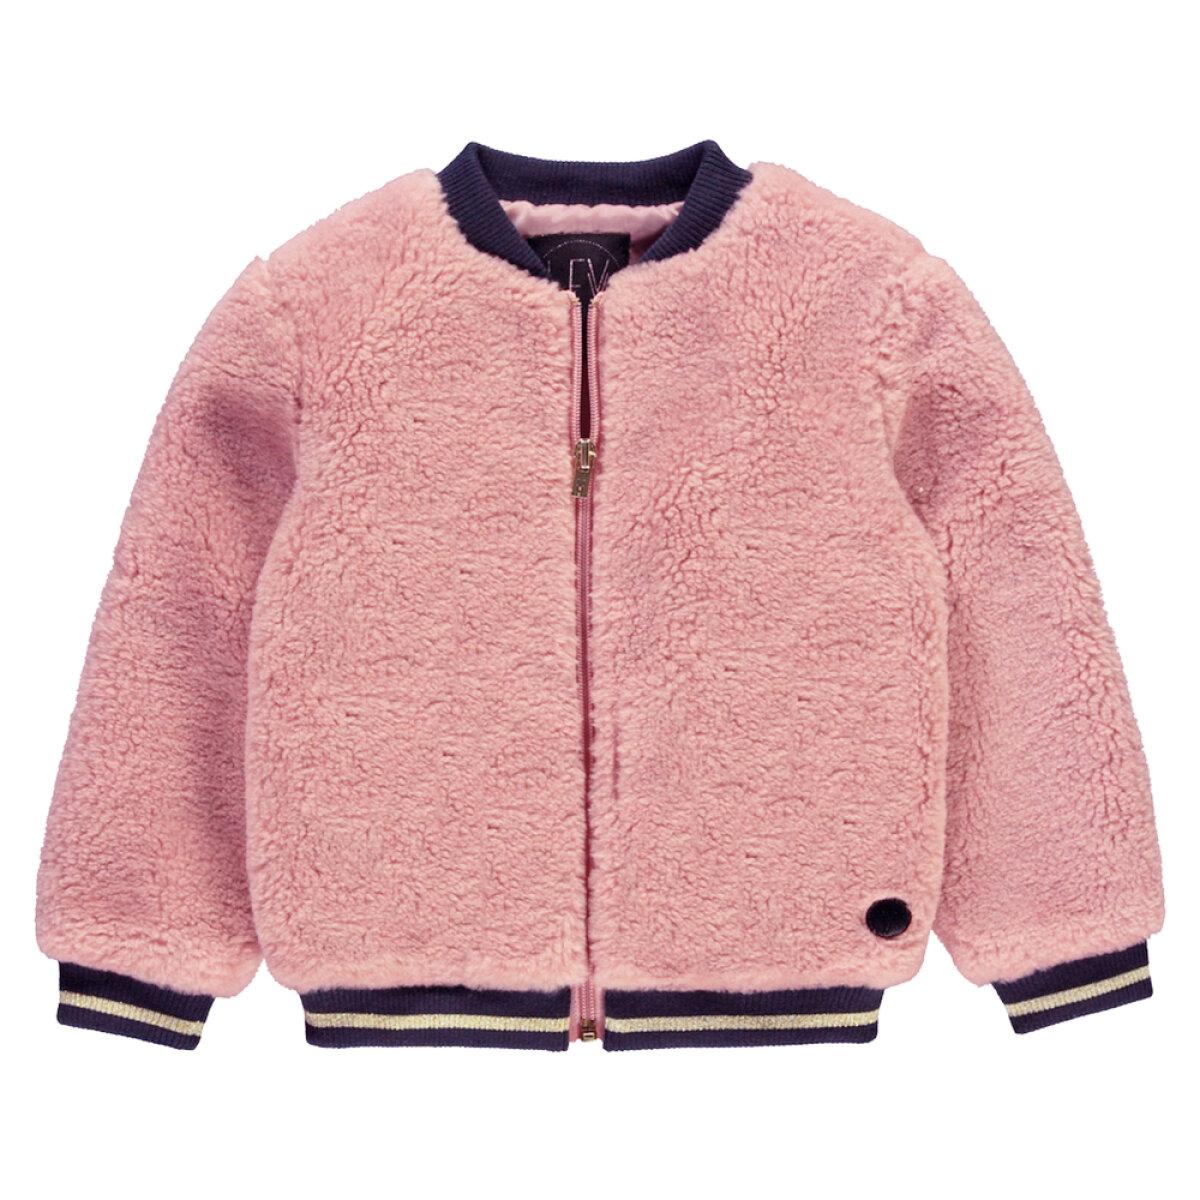 https://myshop.s3-external-3.amazonaws.com/shop3044400.pictures.levv-emmee-dusty-pink.jpg